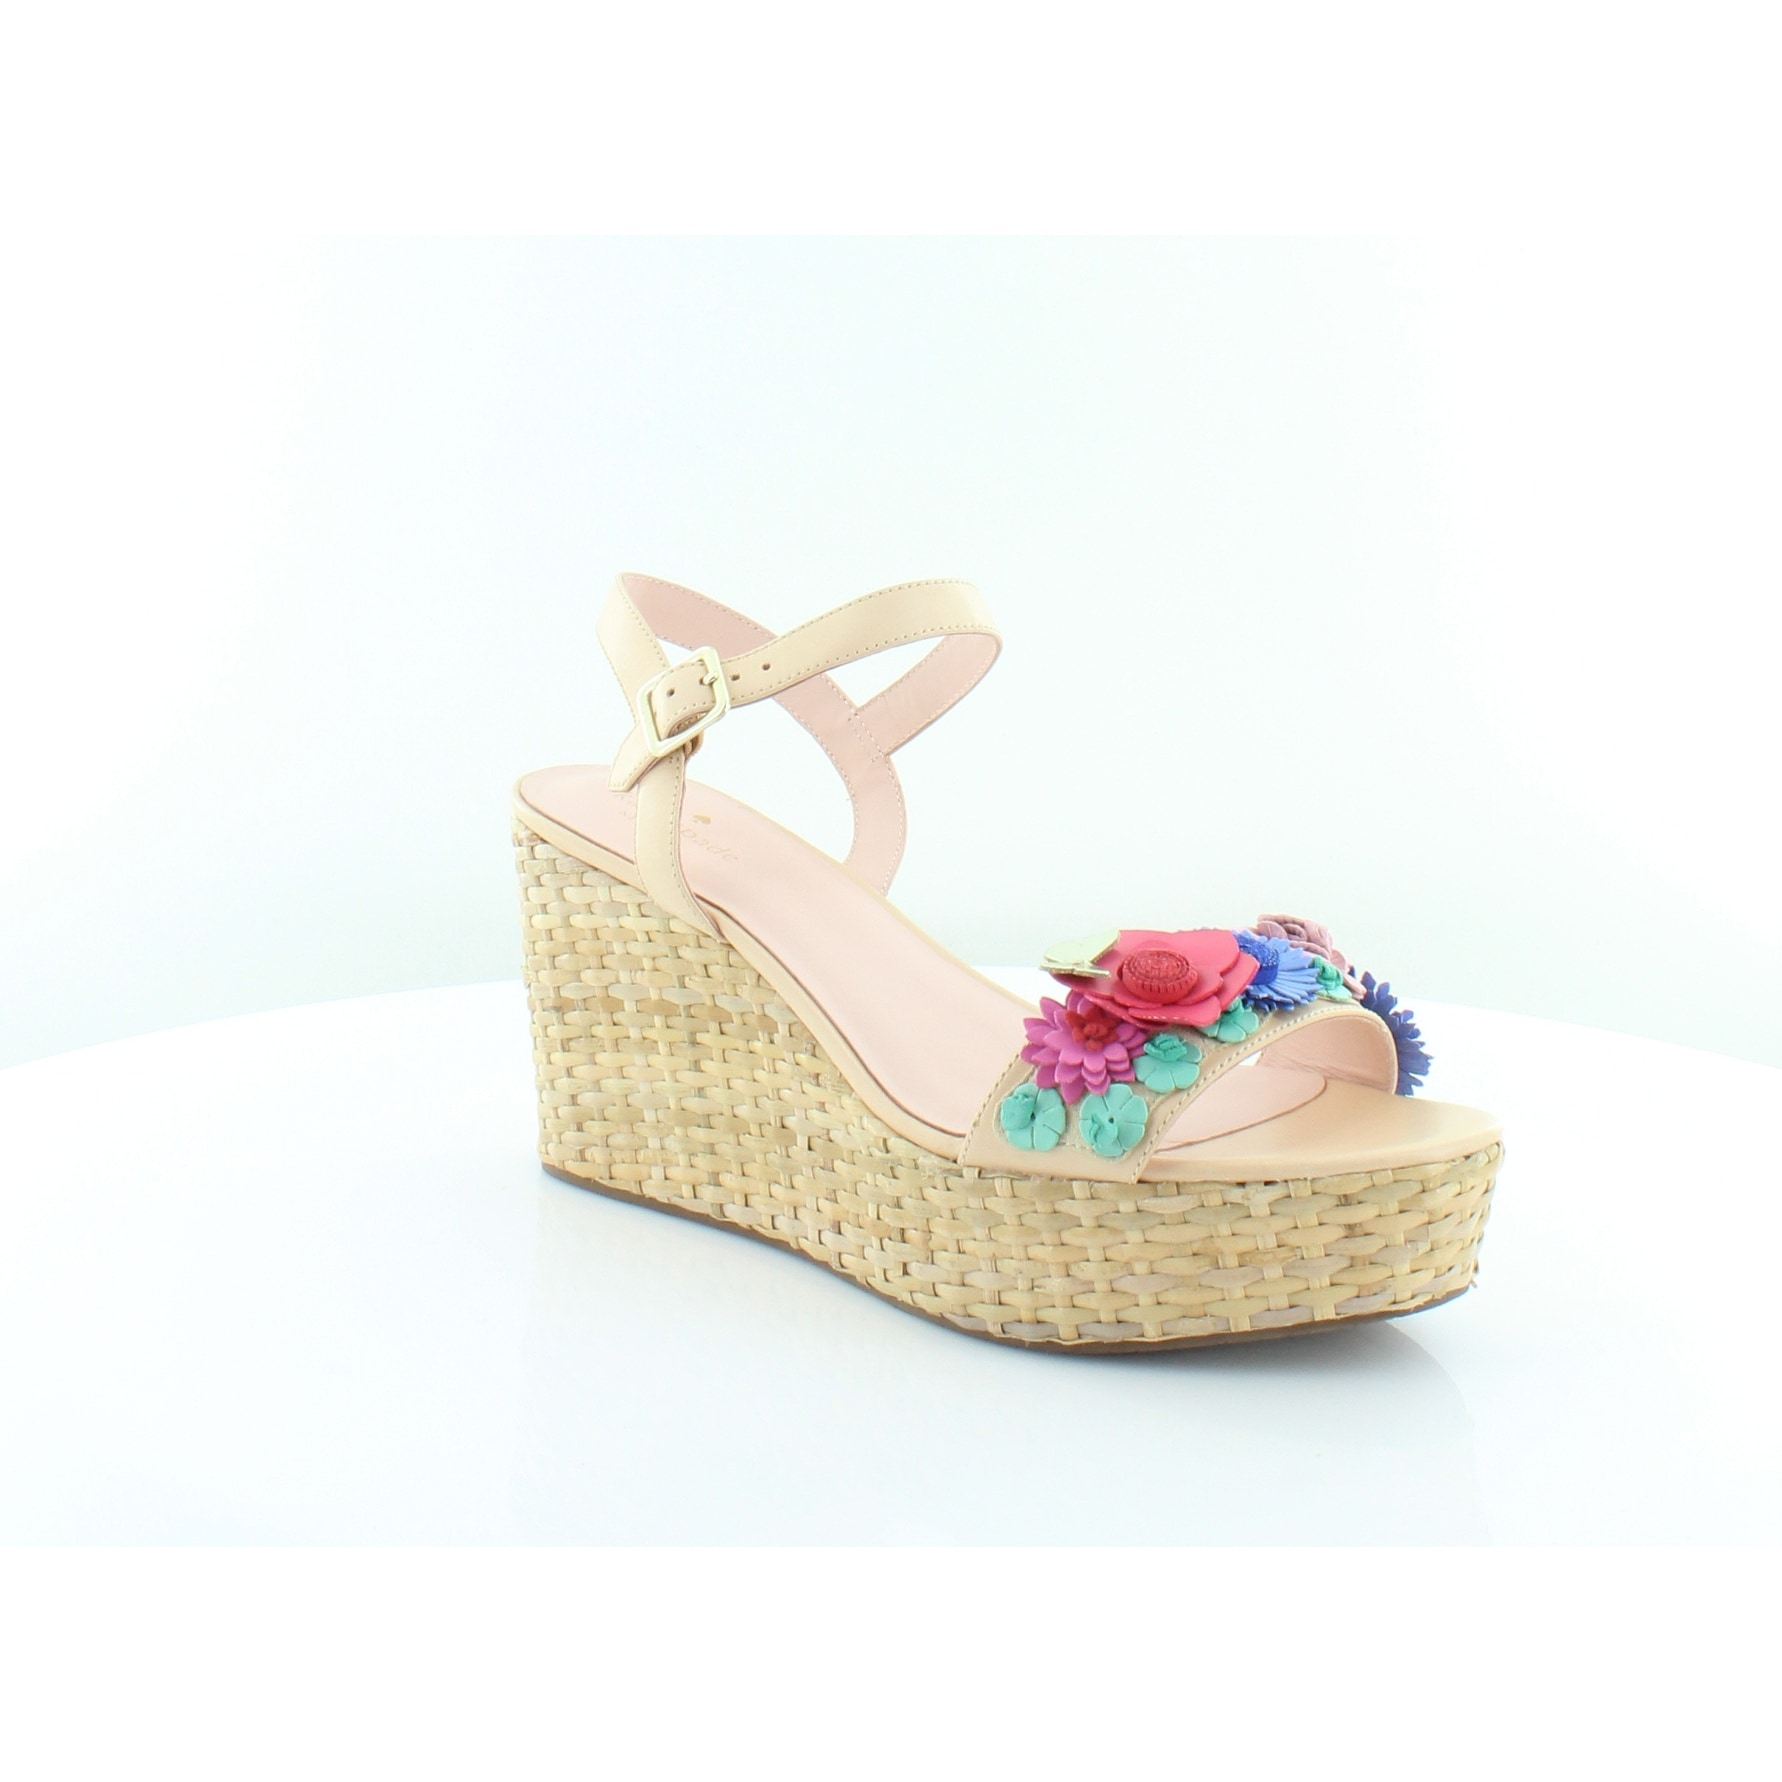 8299e96b2e2 Buy Size 11 High Heel Women s Sandals Online at Overstock